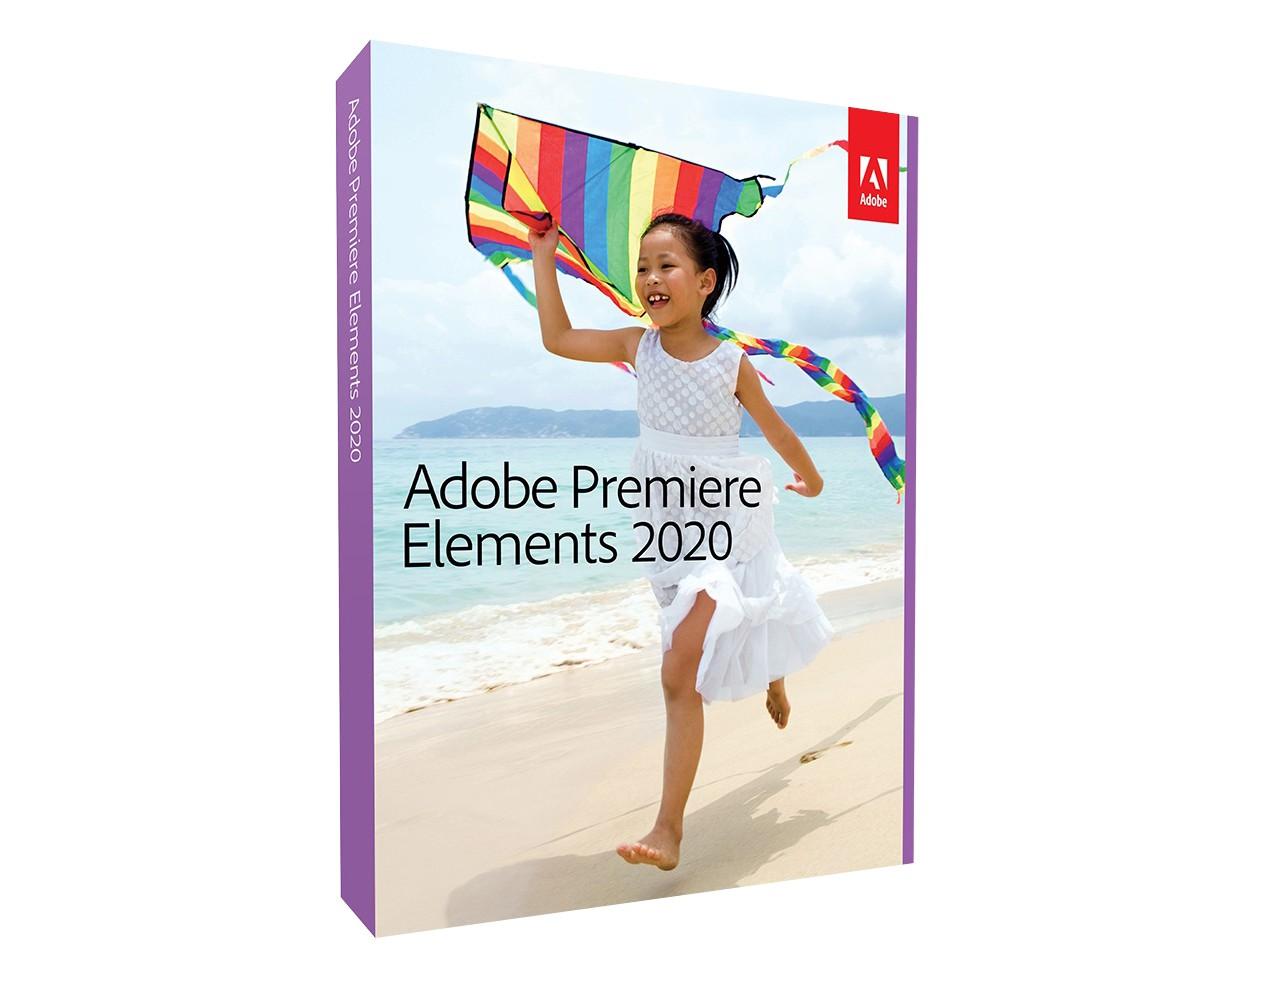 Adobe Premiere Elements 2020 - Dutch - Windows